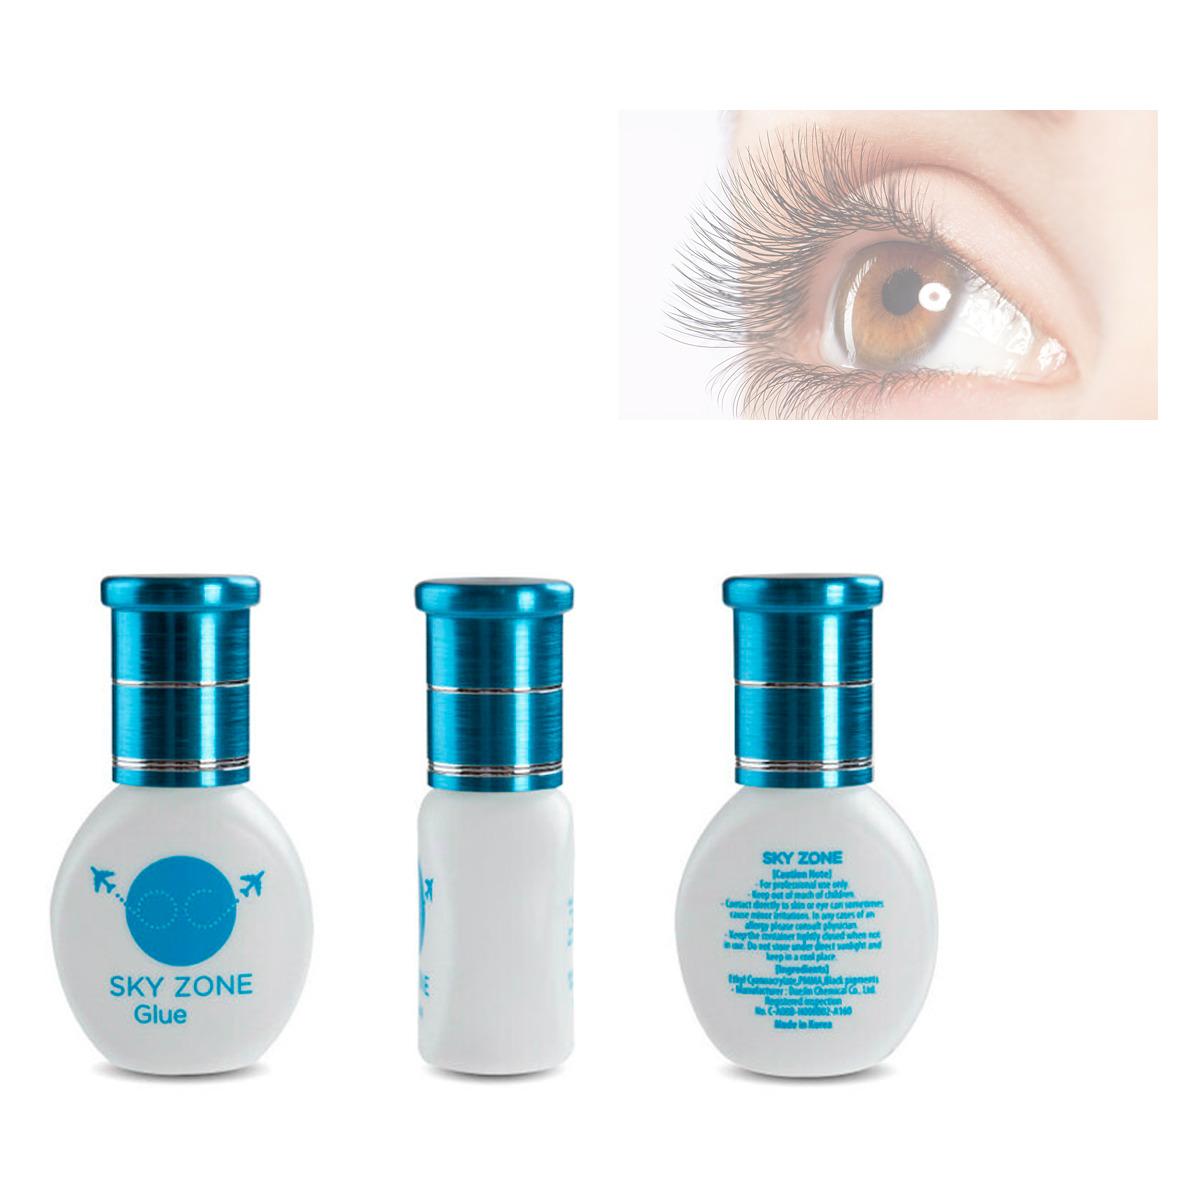 Adhesivo Pegamento Extensiones Pestañas Eyelash Glue